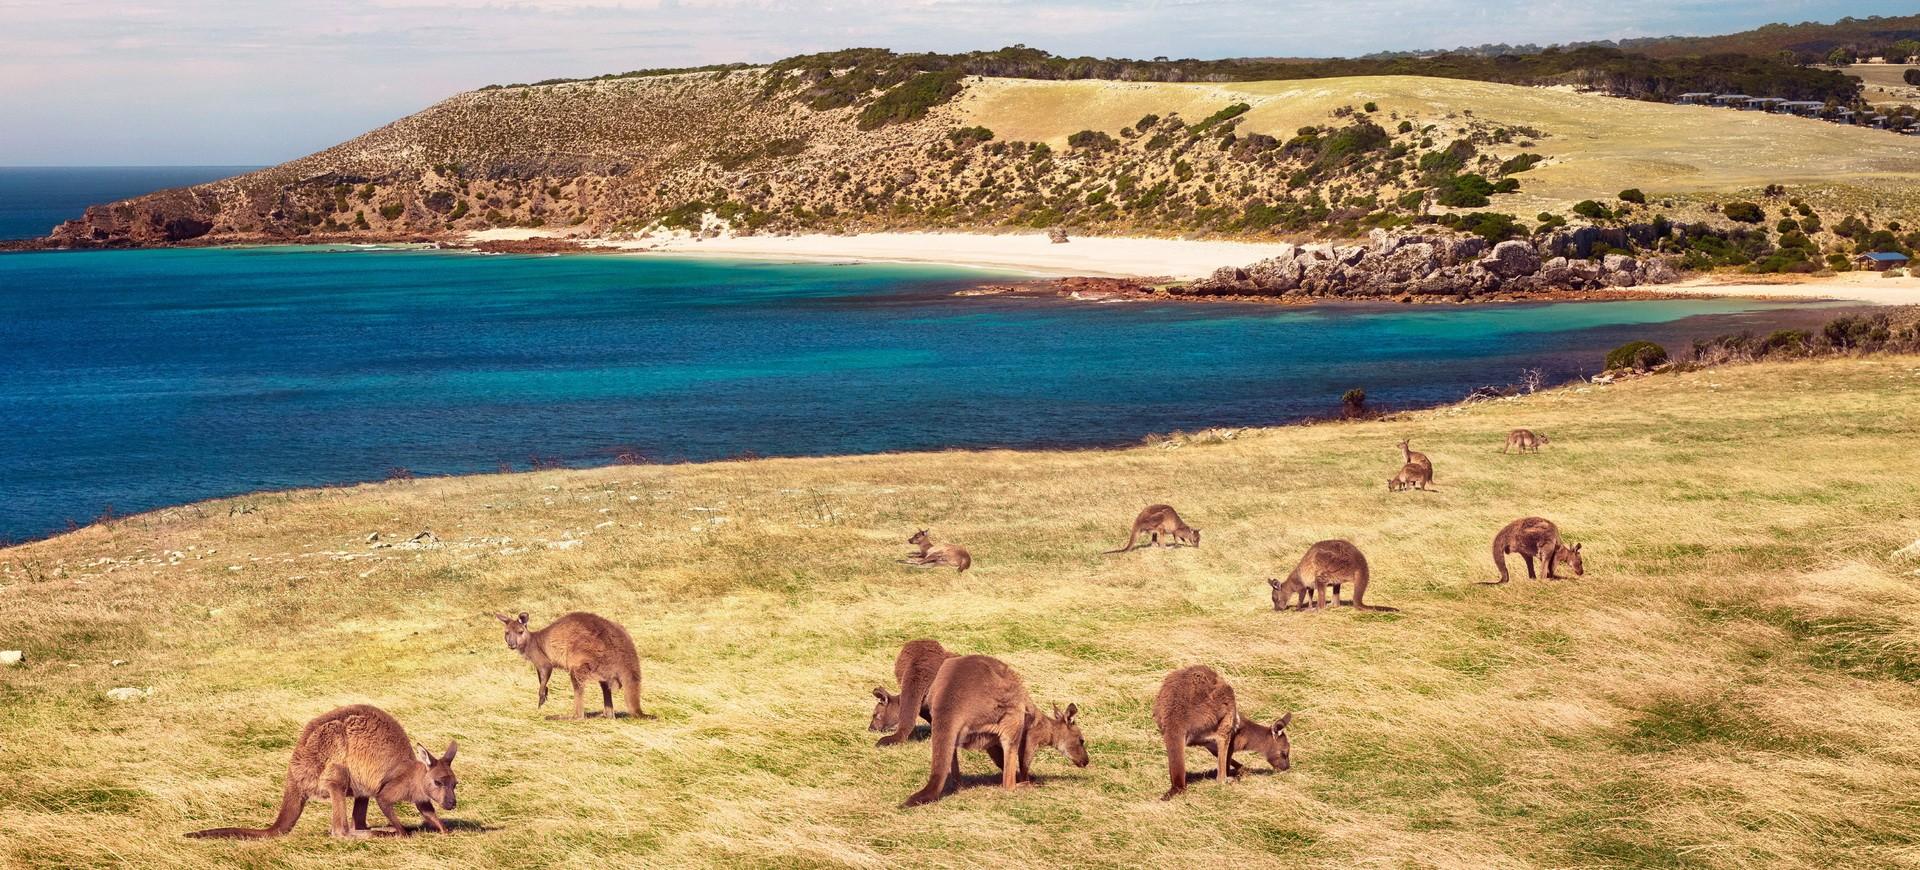 Kangaroos à Stokes Bay à Kangaroo Island Australie